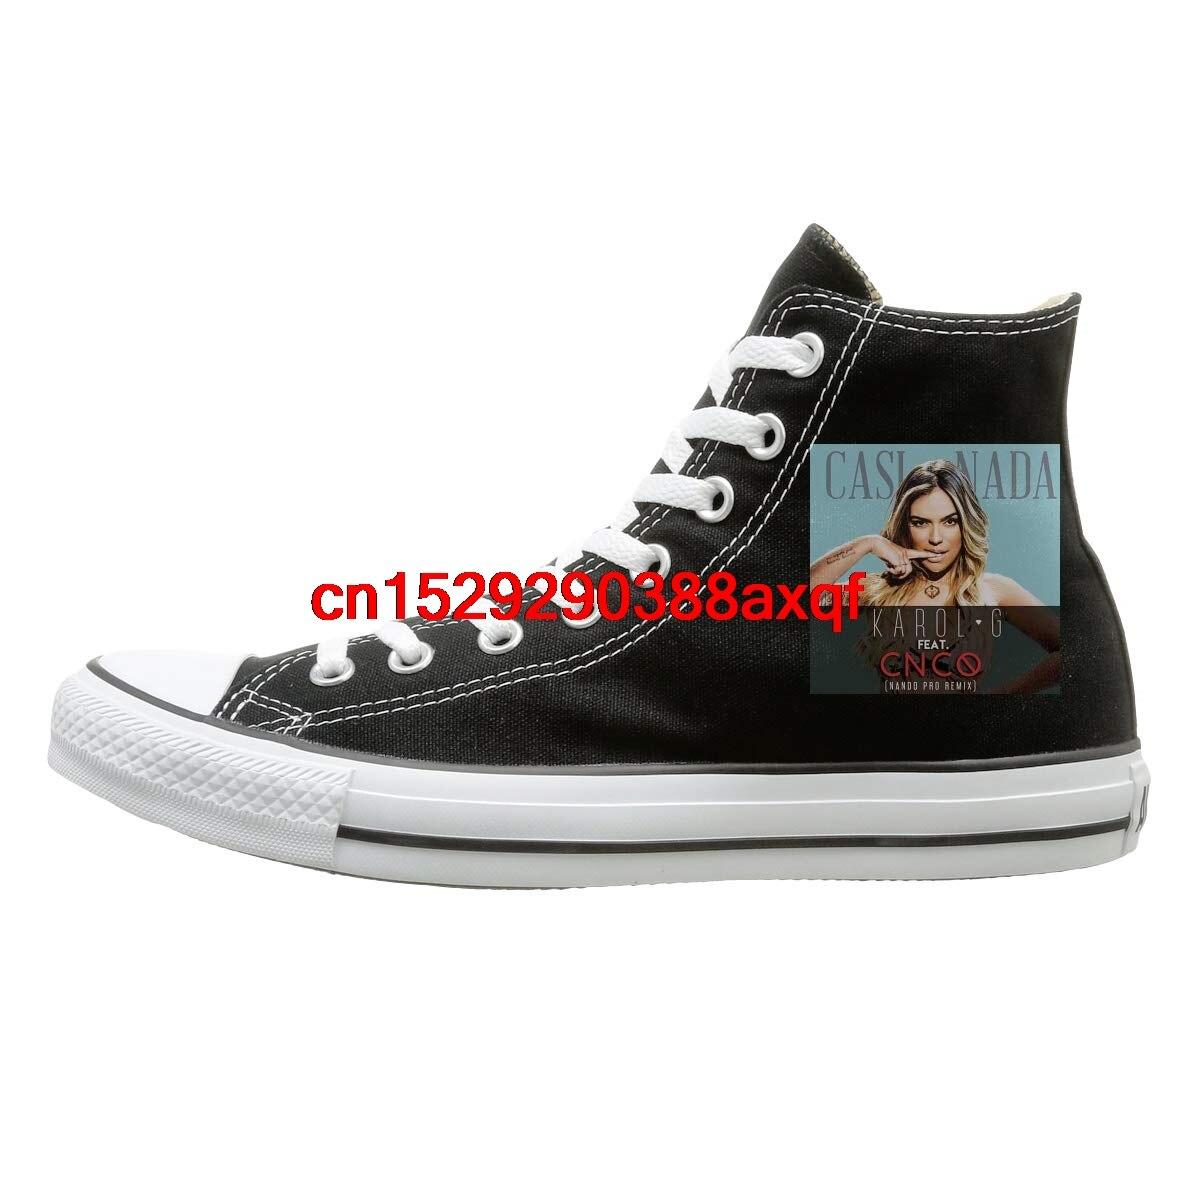 High top Canvas Shoes Sneaker Karol G